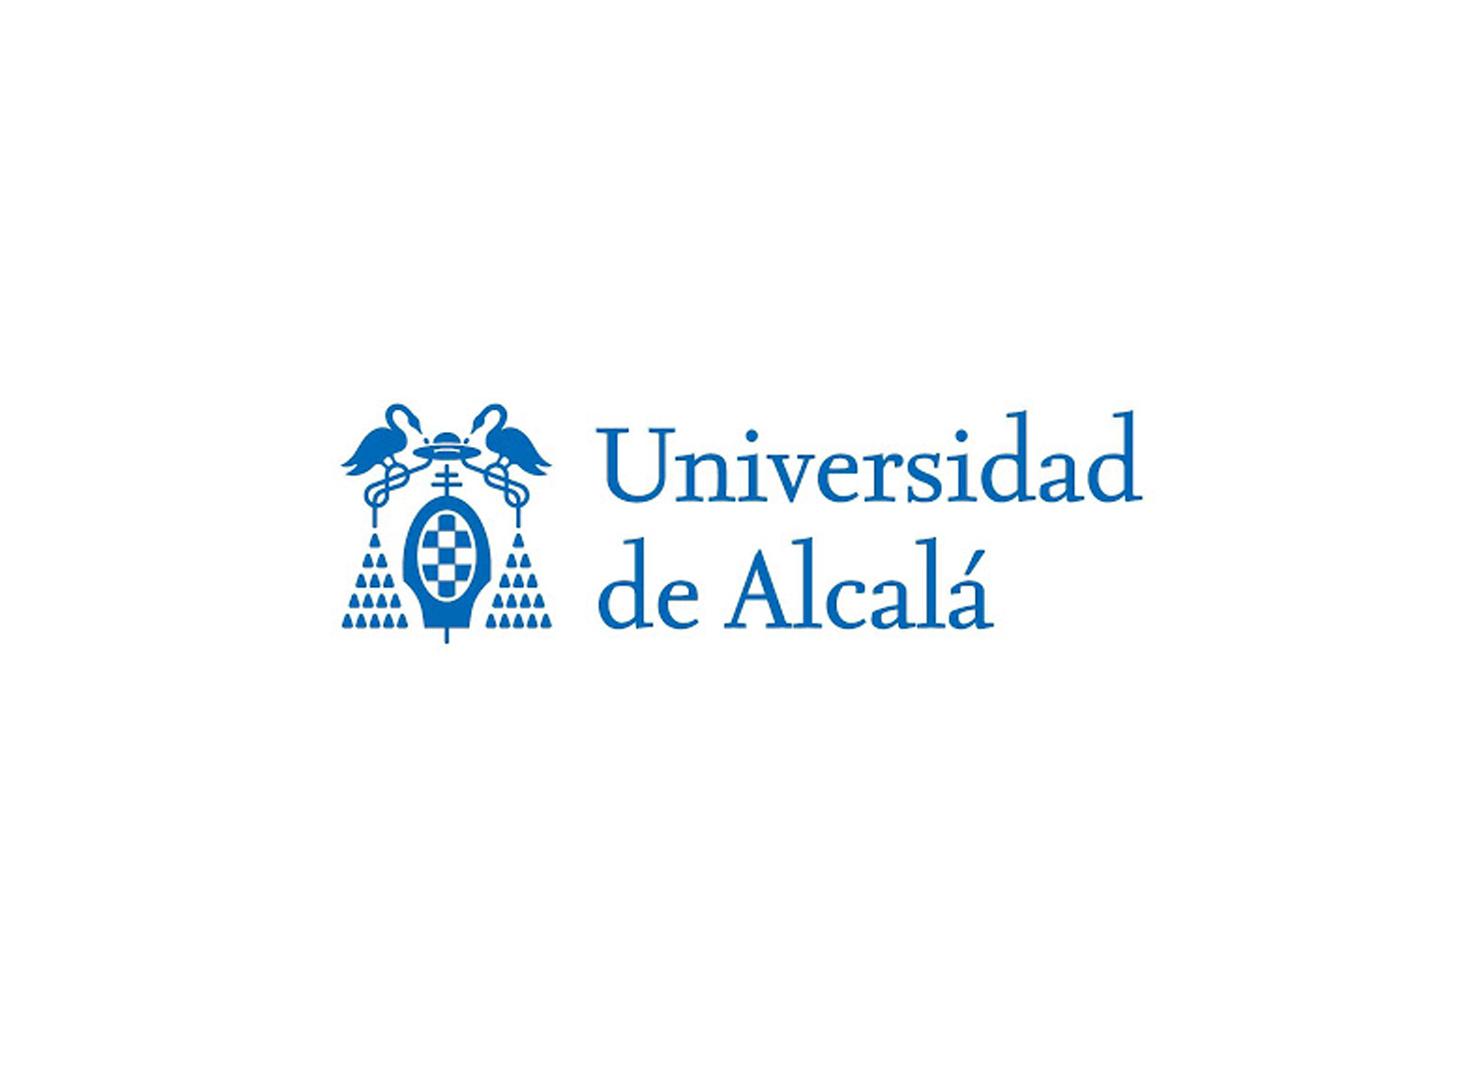 universidad-alcaa-de-henares_cumulolimbo-studio_natalia-matesanz